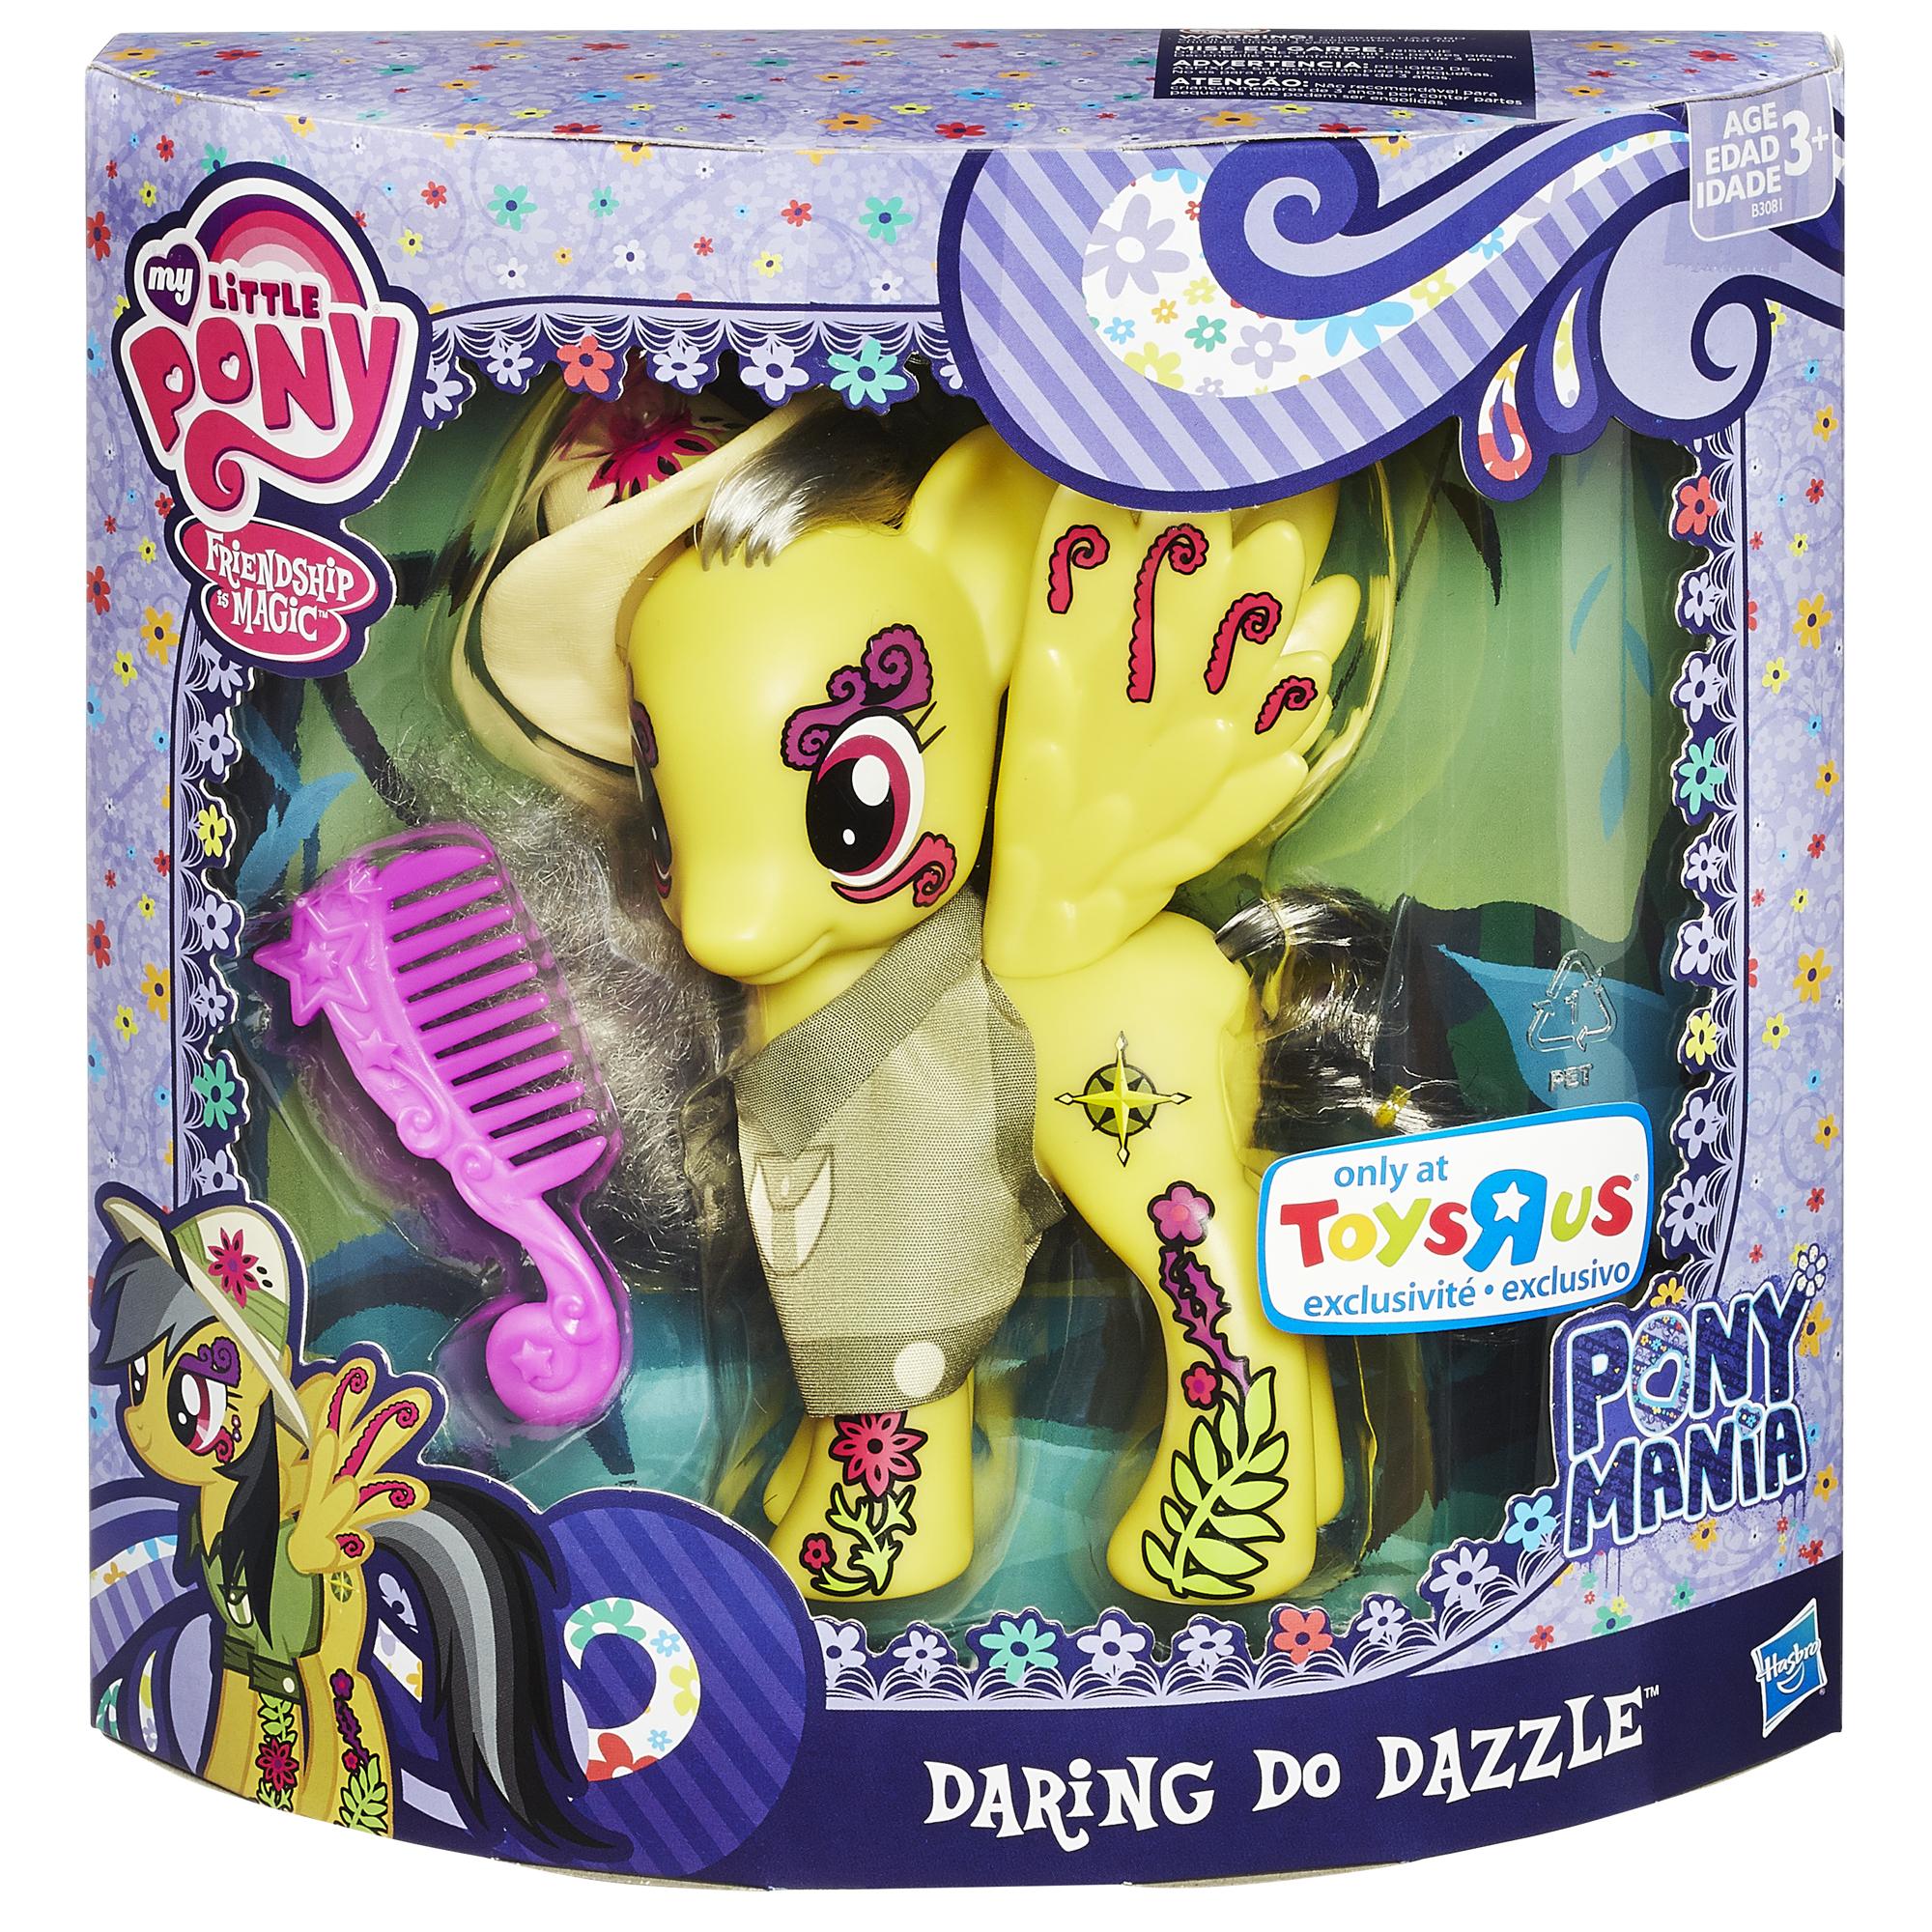 mlp-daring-do-dazzle-in-package--141319